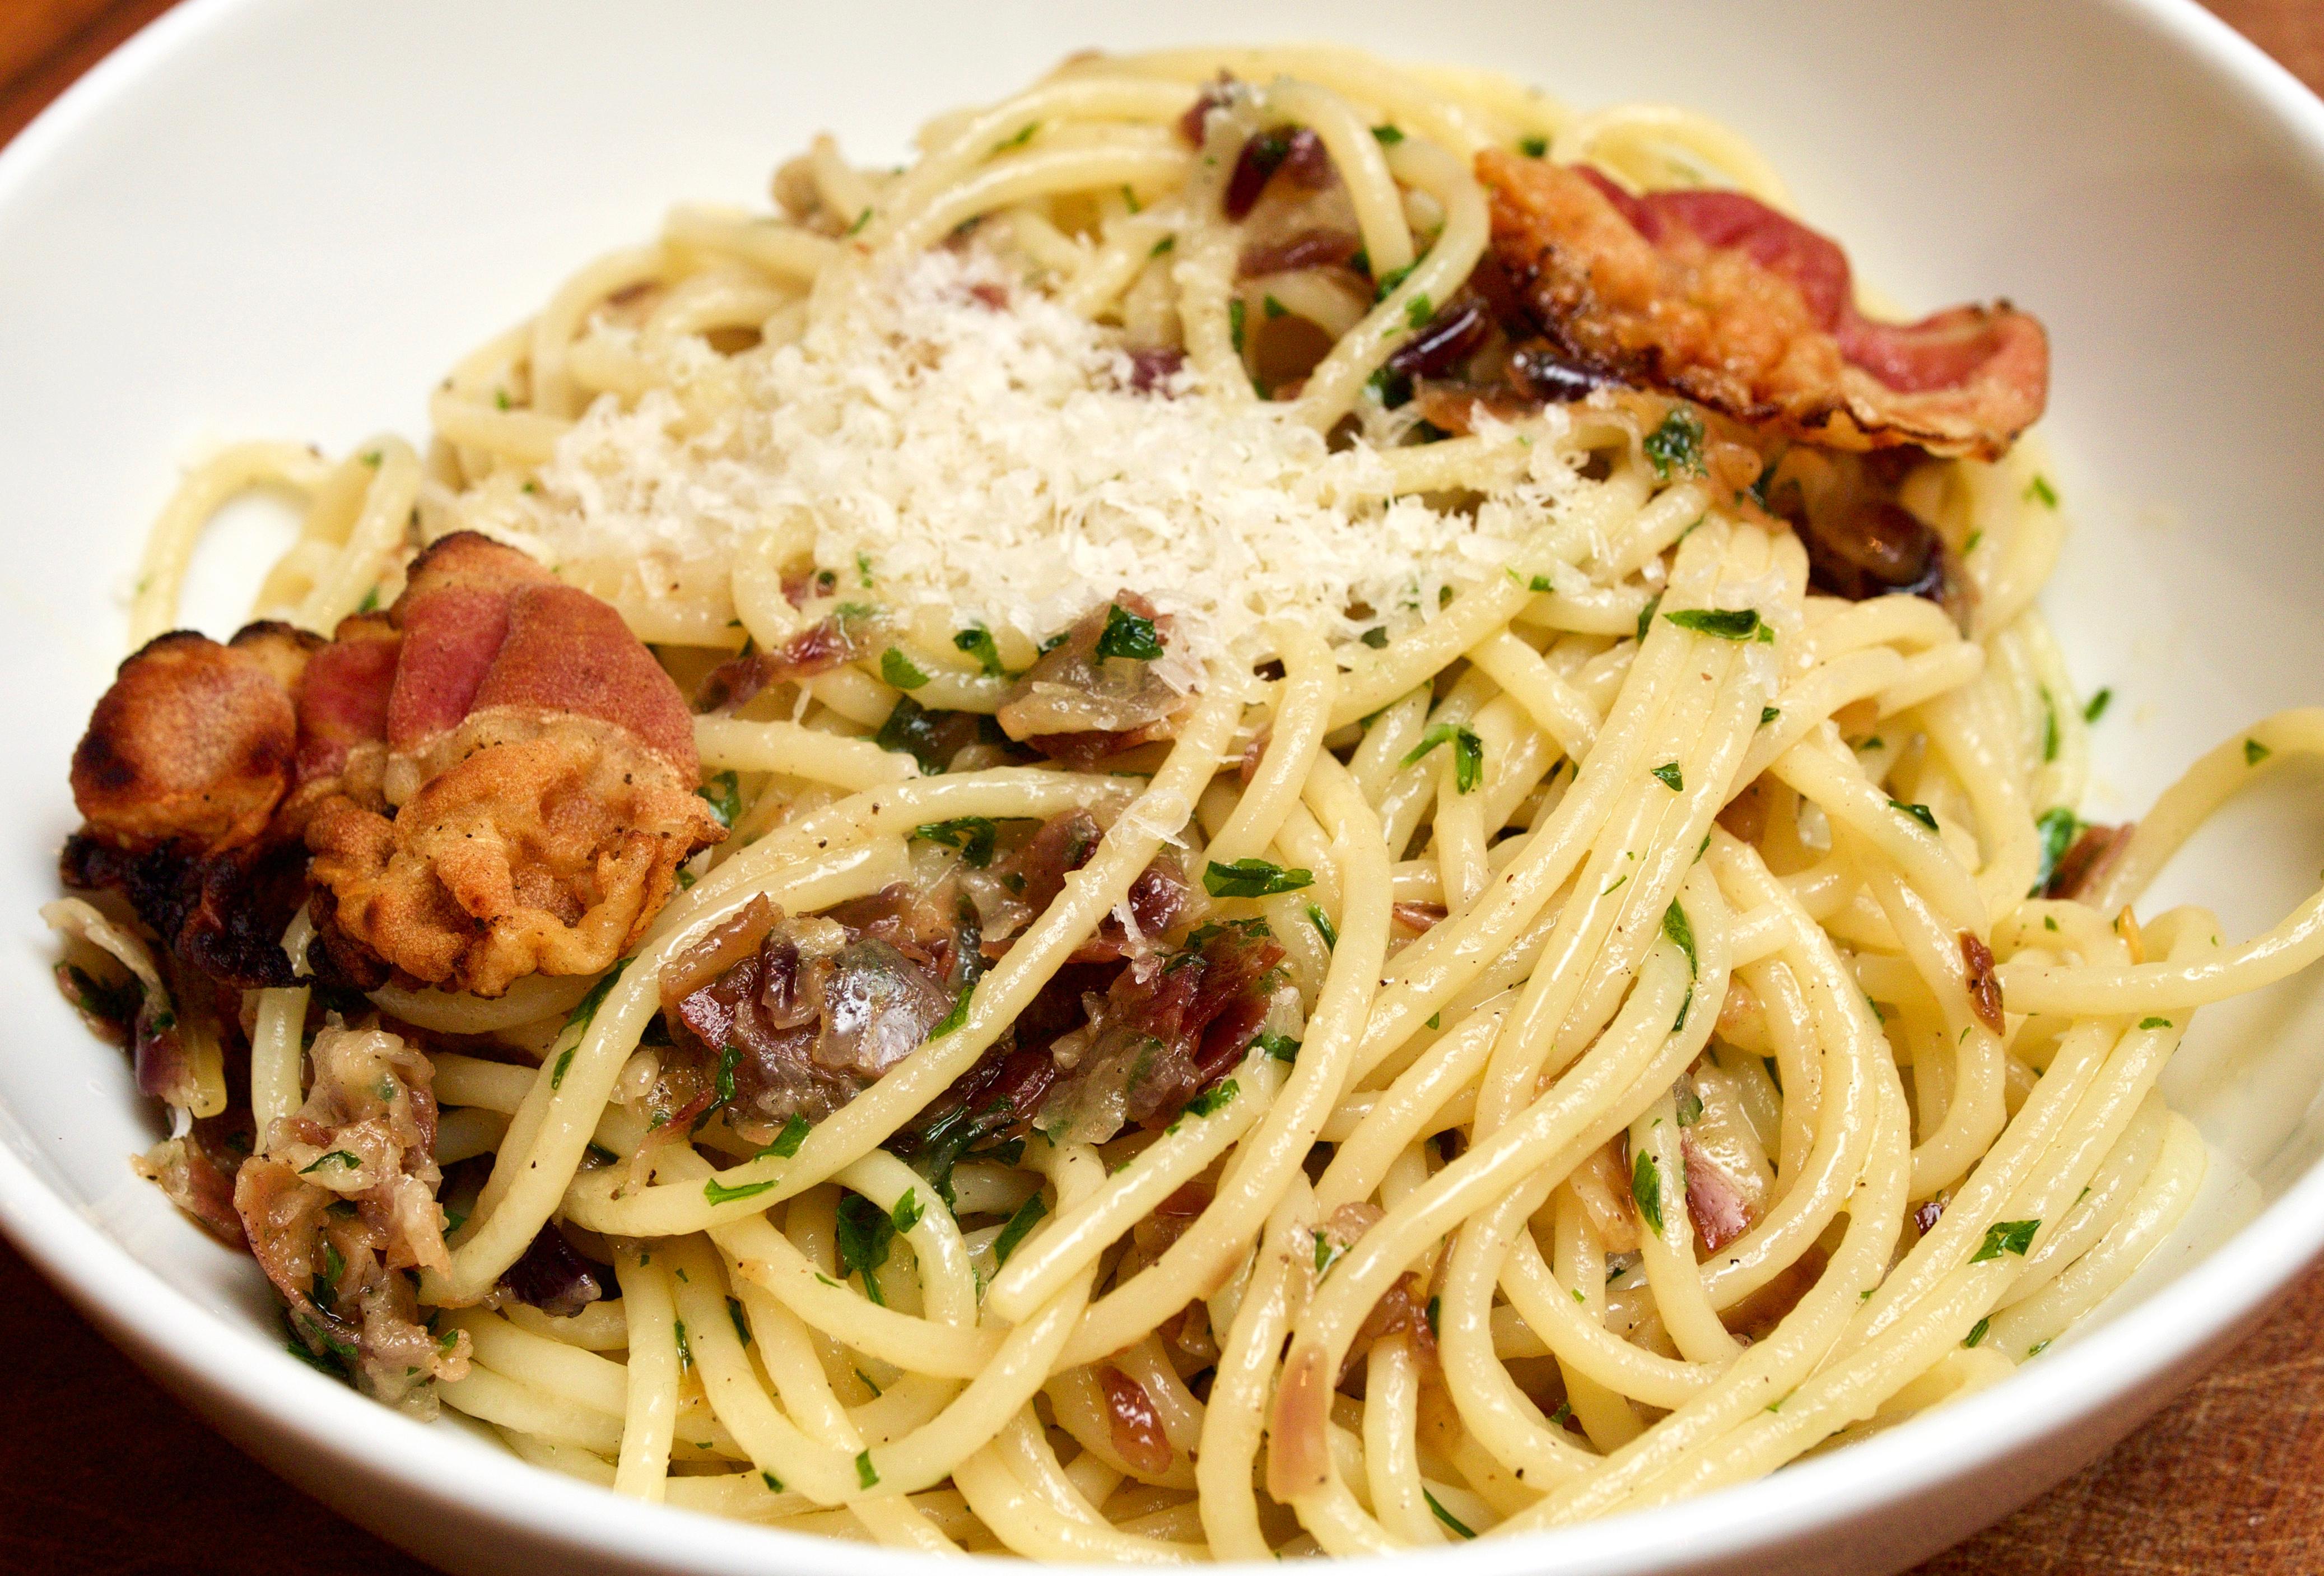 Spaghetti with parsley, pancetta & parmigiano